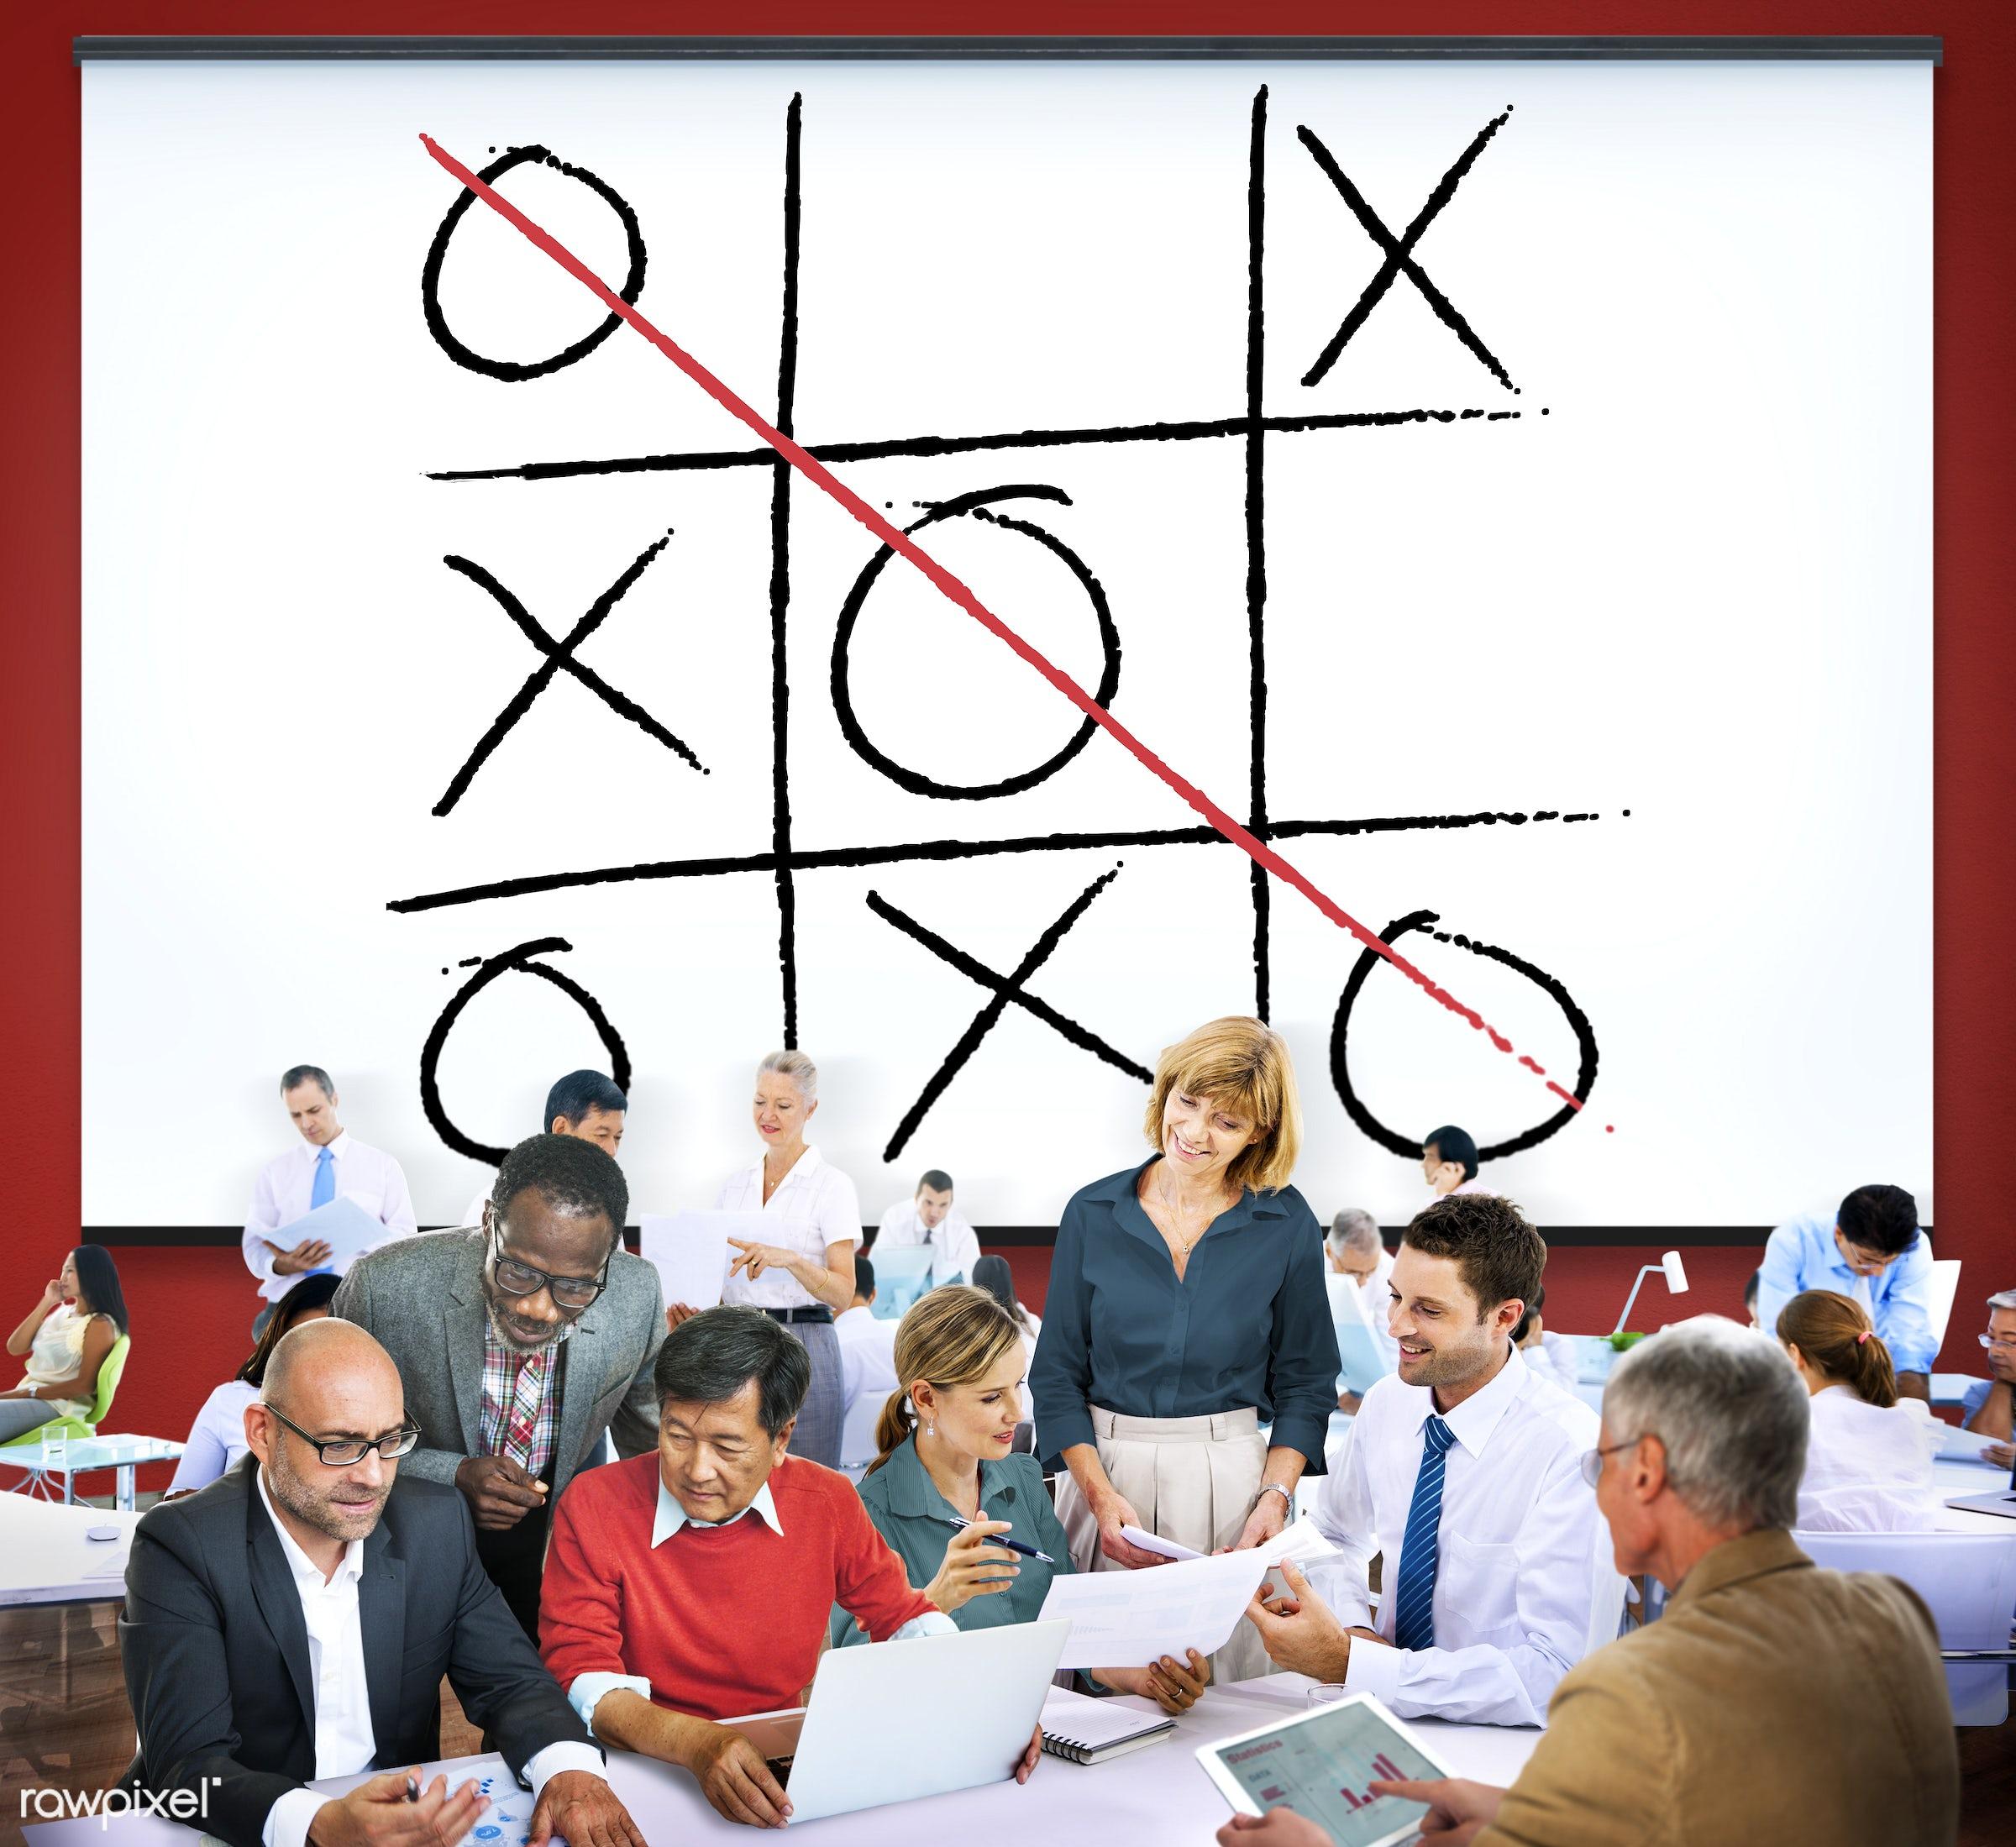 analysing, analysis, blackboard, business, business people, businessmen, businesswomen, busy, chalk board, challenge,...